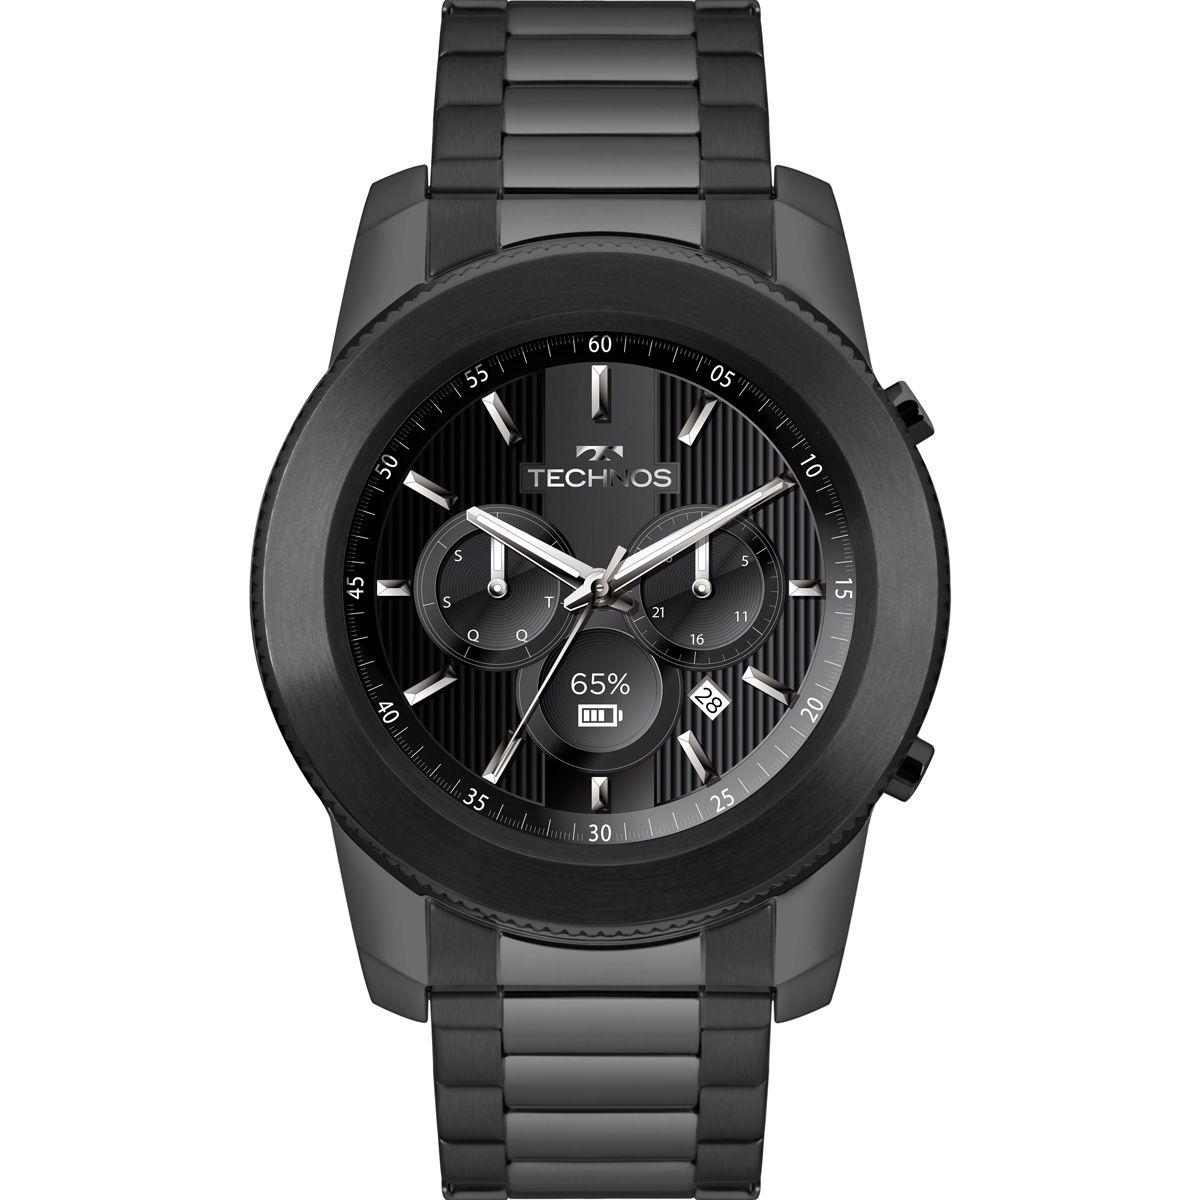 ec13584171744 Relógio Masculino Technos Connect Smartwatch M1AB 4P Aço Preto - Vitrino  Relógios ...